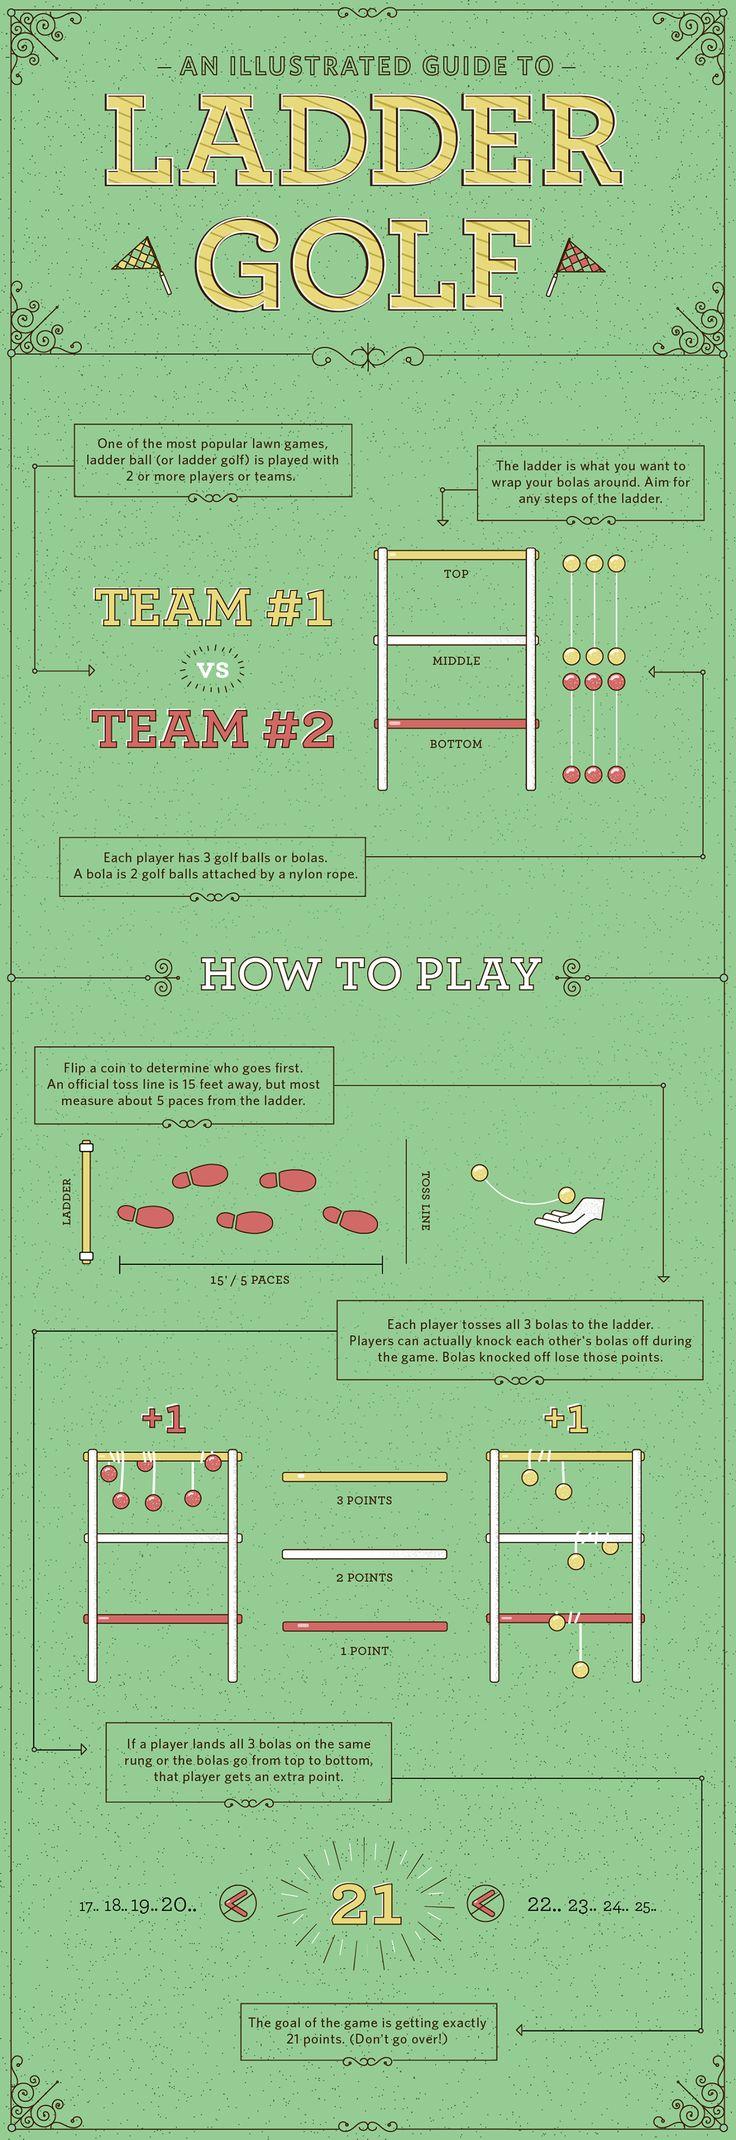 Ladder Golf Infographic on Behance